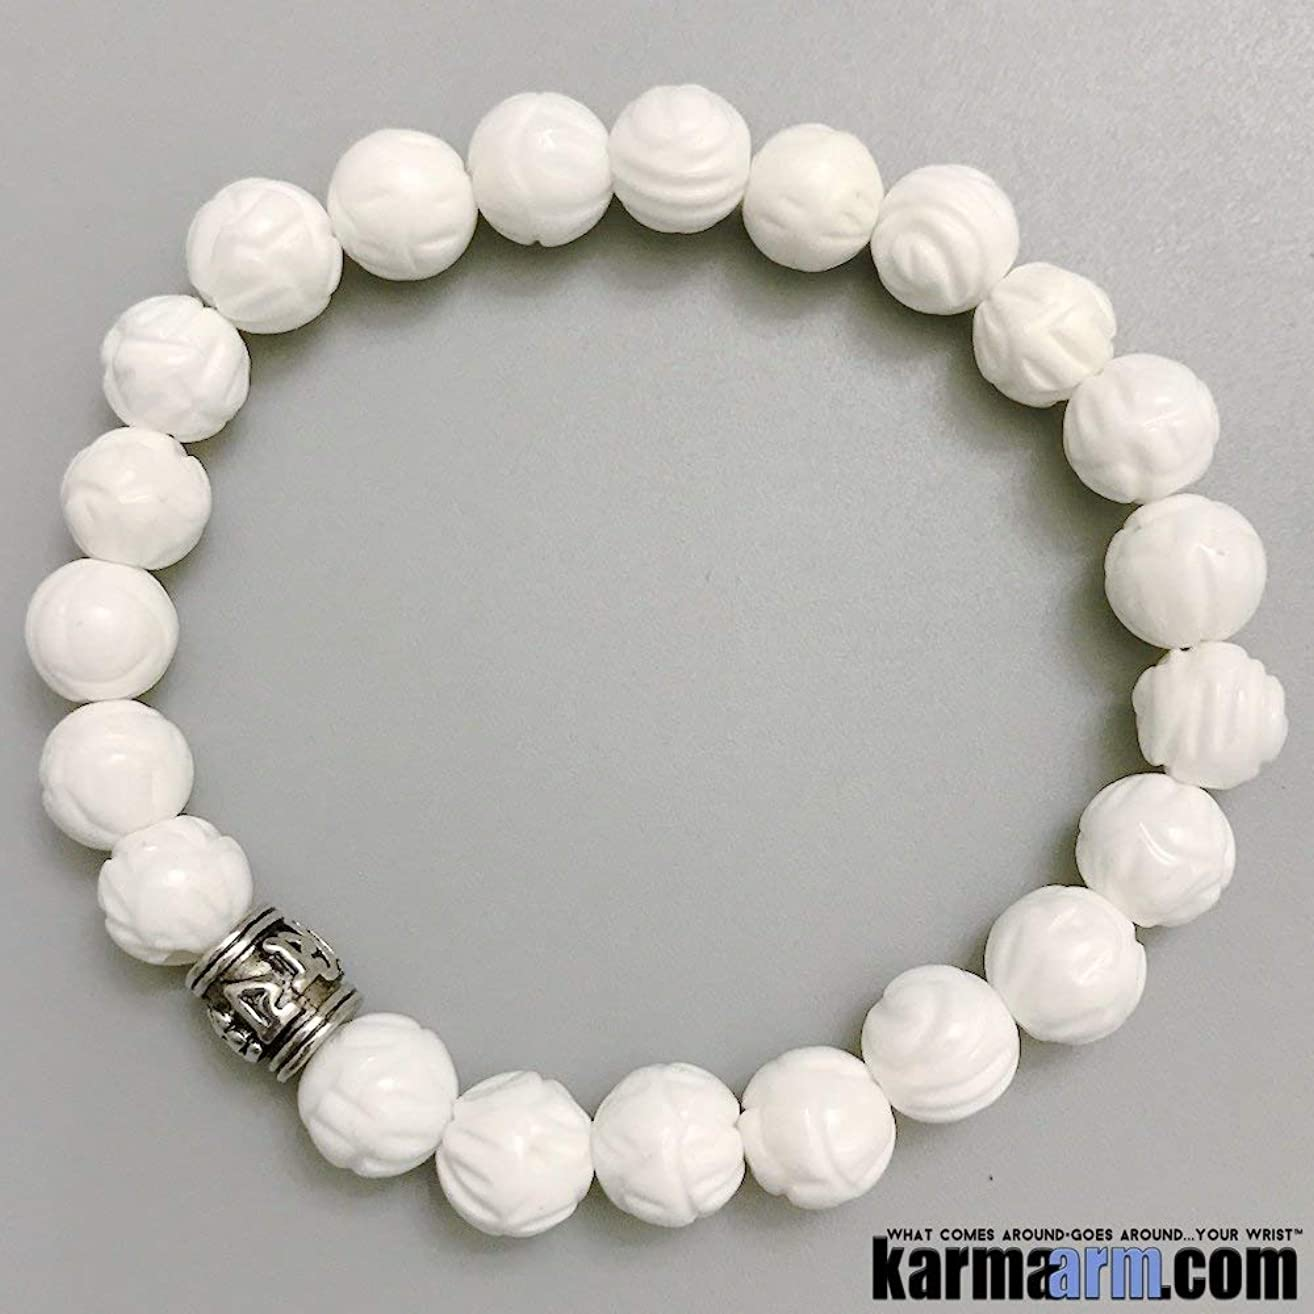 Om Mani Padme Hum Mantra Prayer Wheel: Tridacna ? Yoga Chakra Stretch Beaded Bracelet